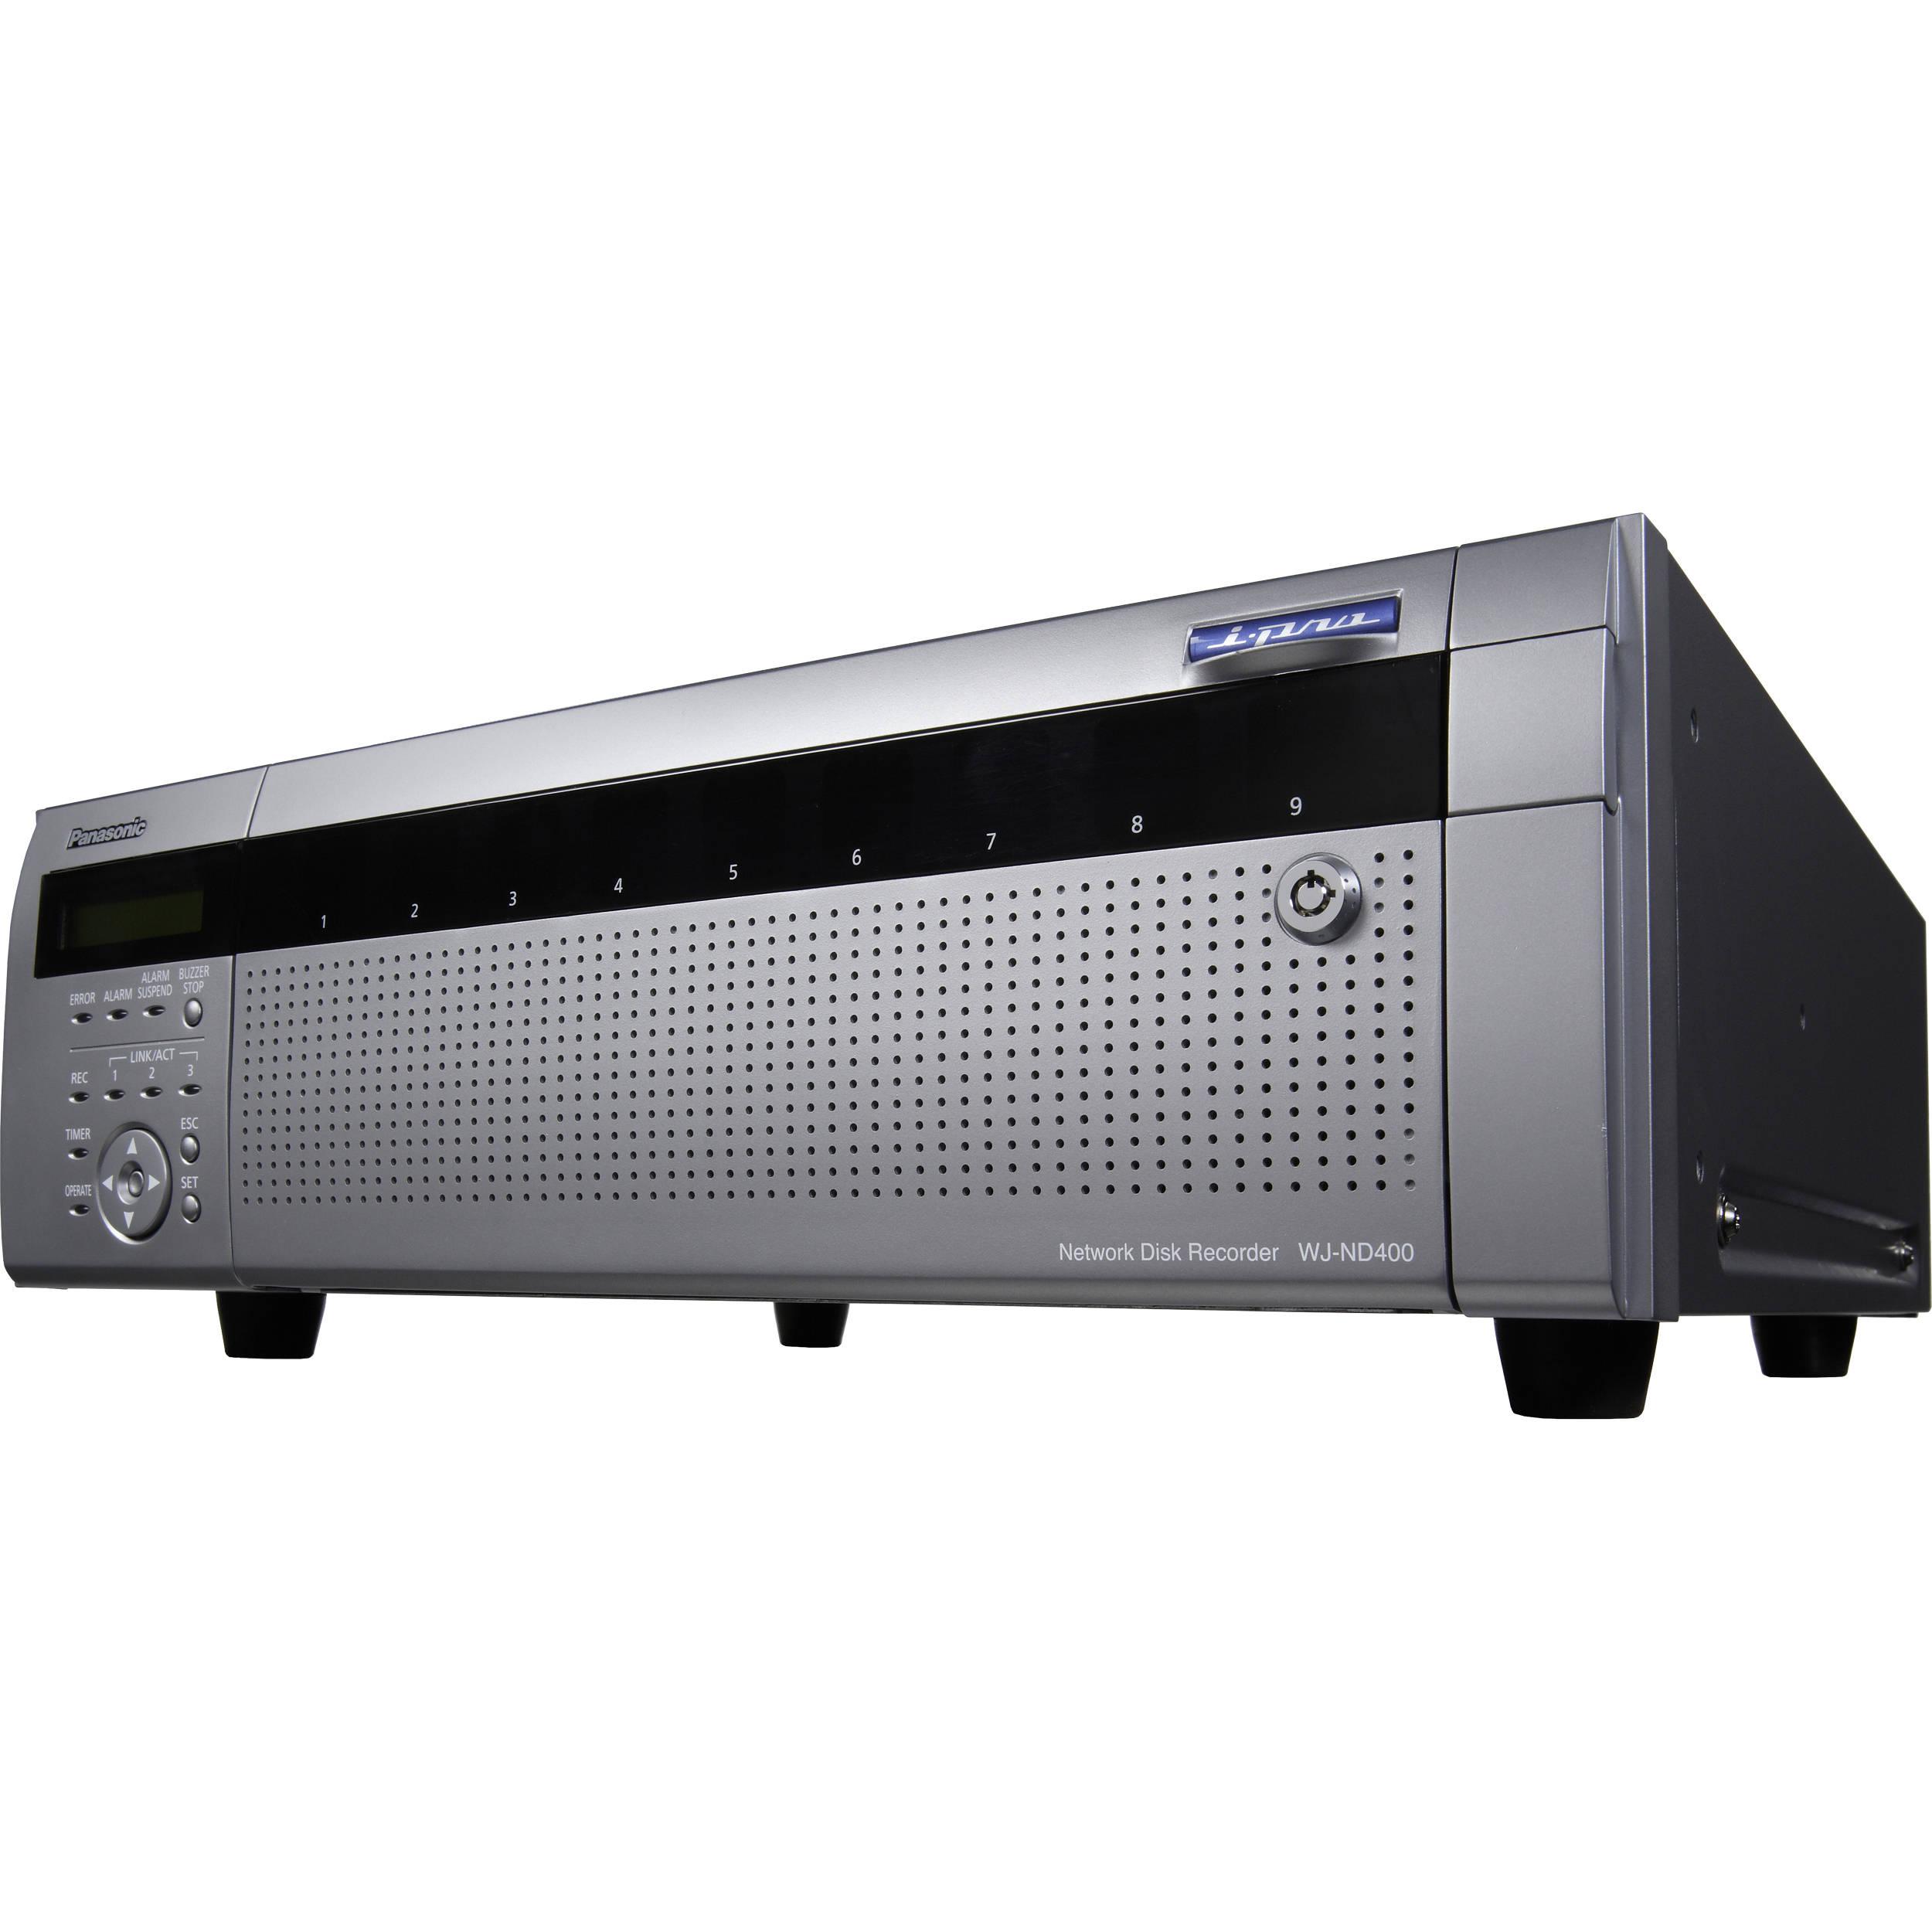 Enregistreur video panasonic ipro nd400